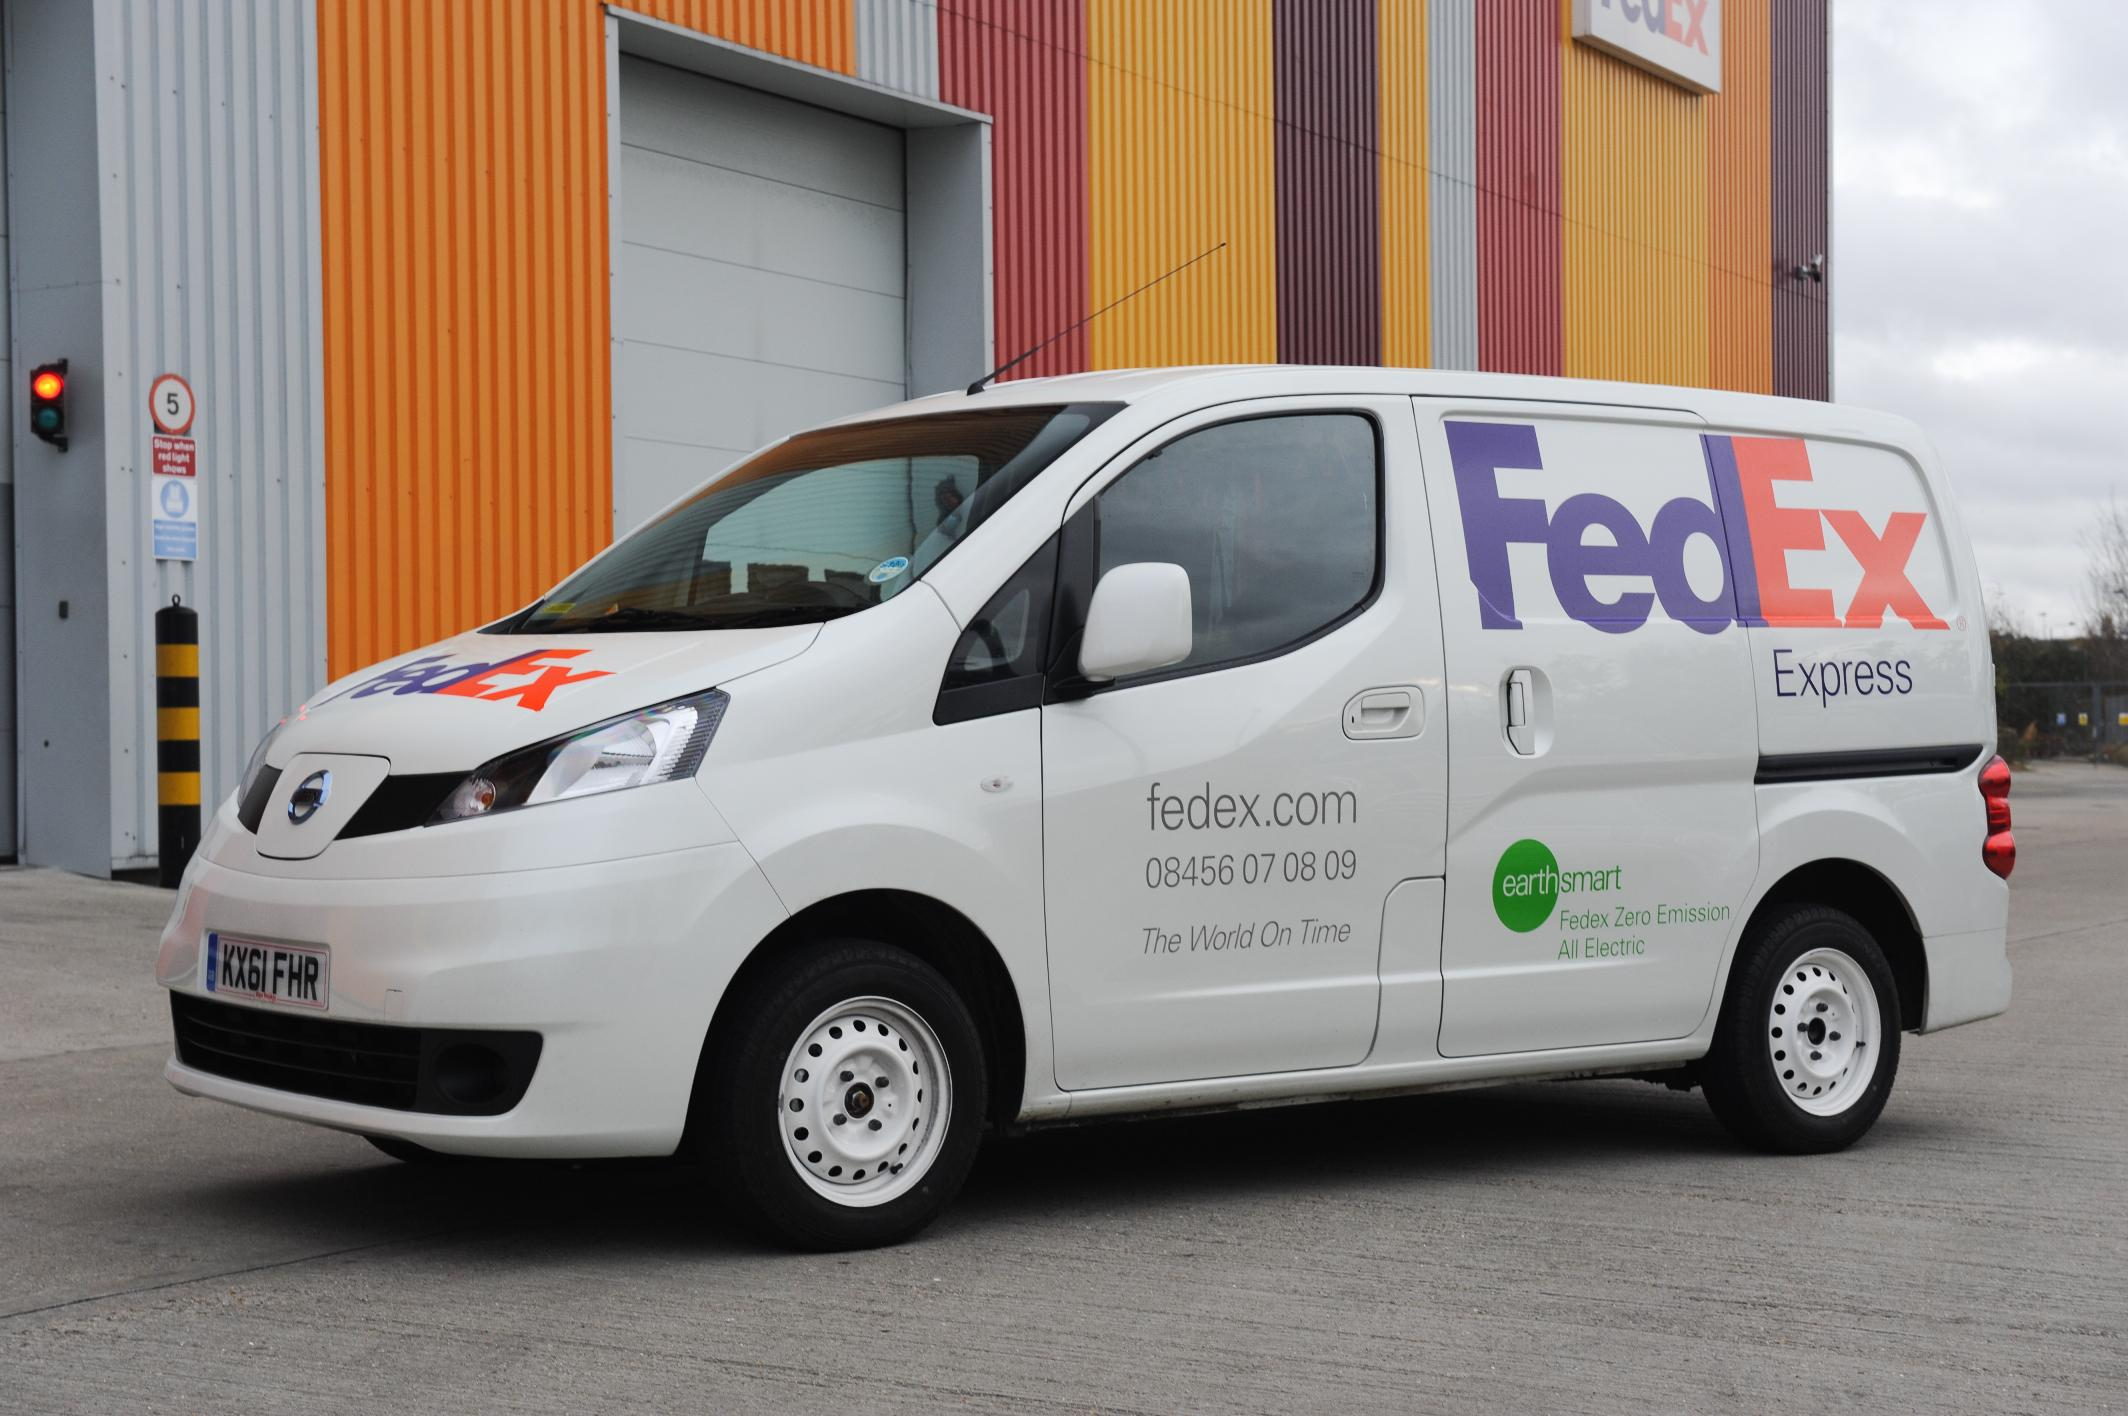 nissan fedex to trial nissan nv200 electric vans in london. Black Bedroom Furniture Sets. Home Design Ideas